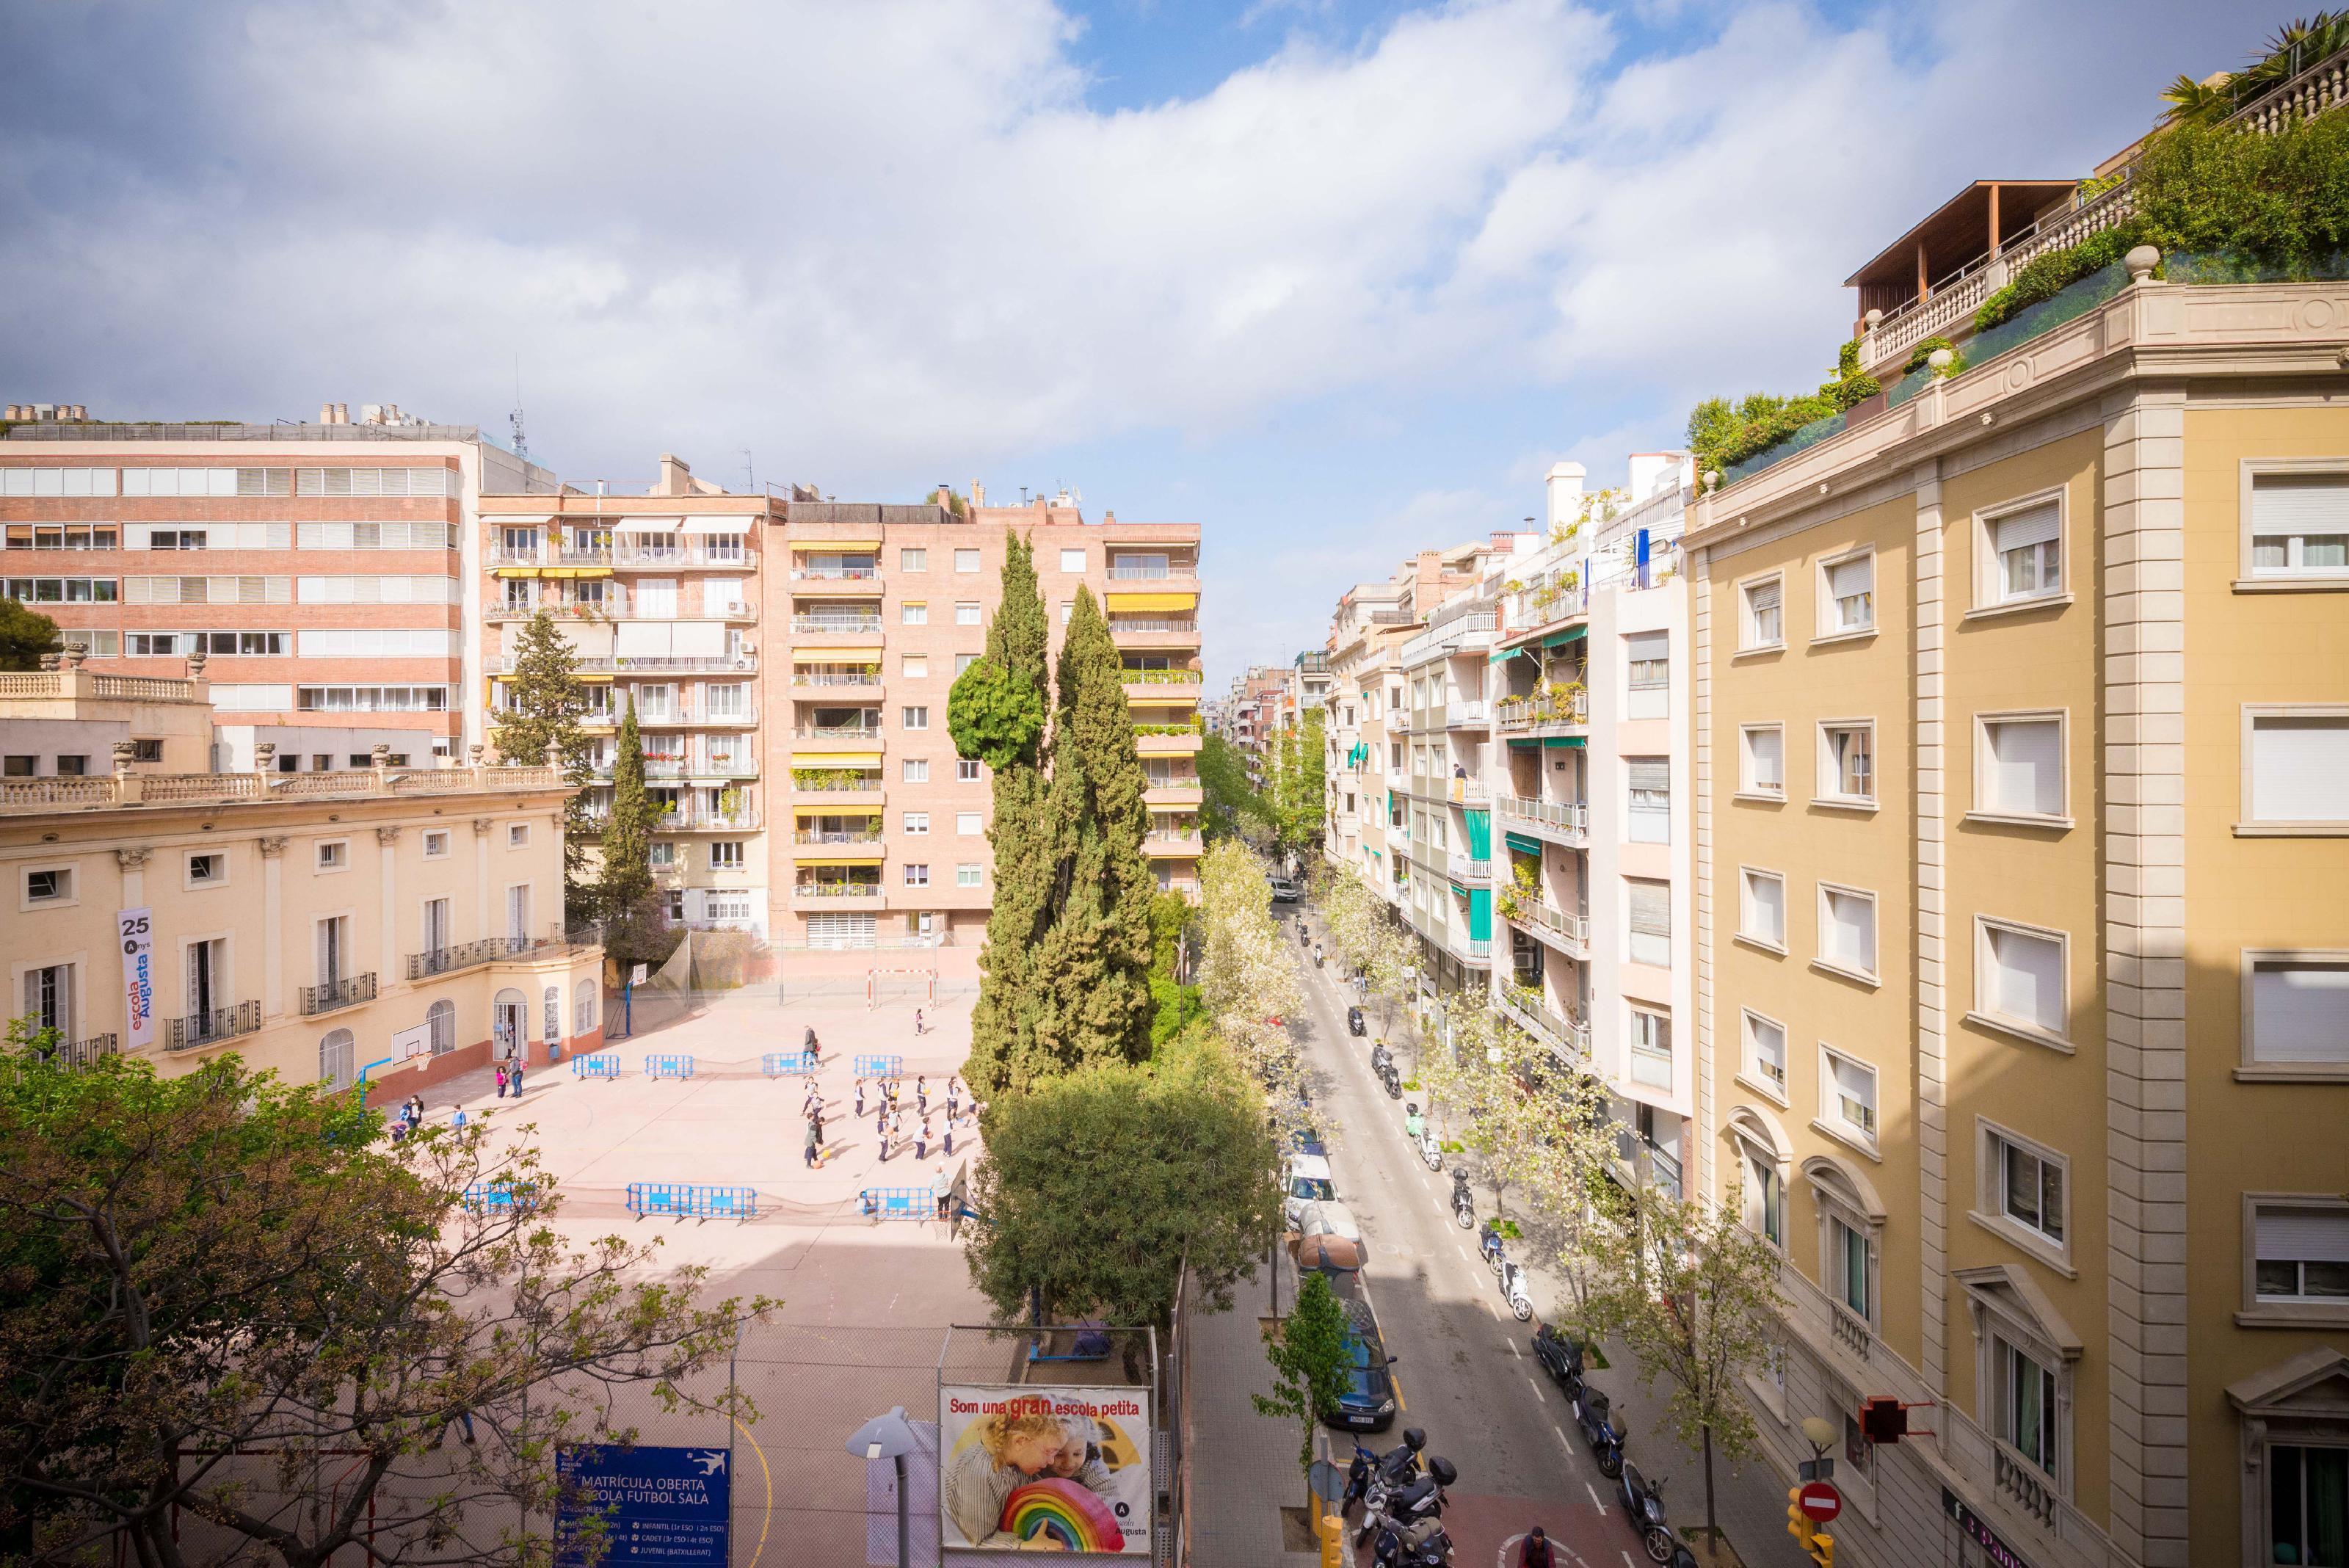 248907 Flat for sale in Sarrià-Sant Gervasi, Sant Gervasi-Galvany 15